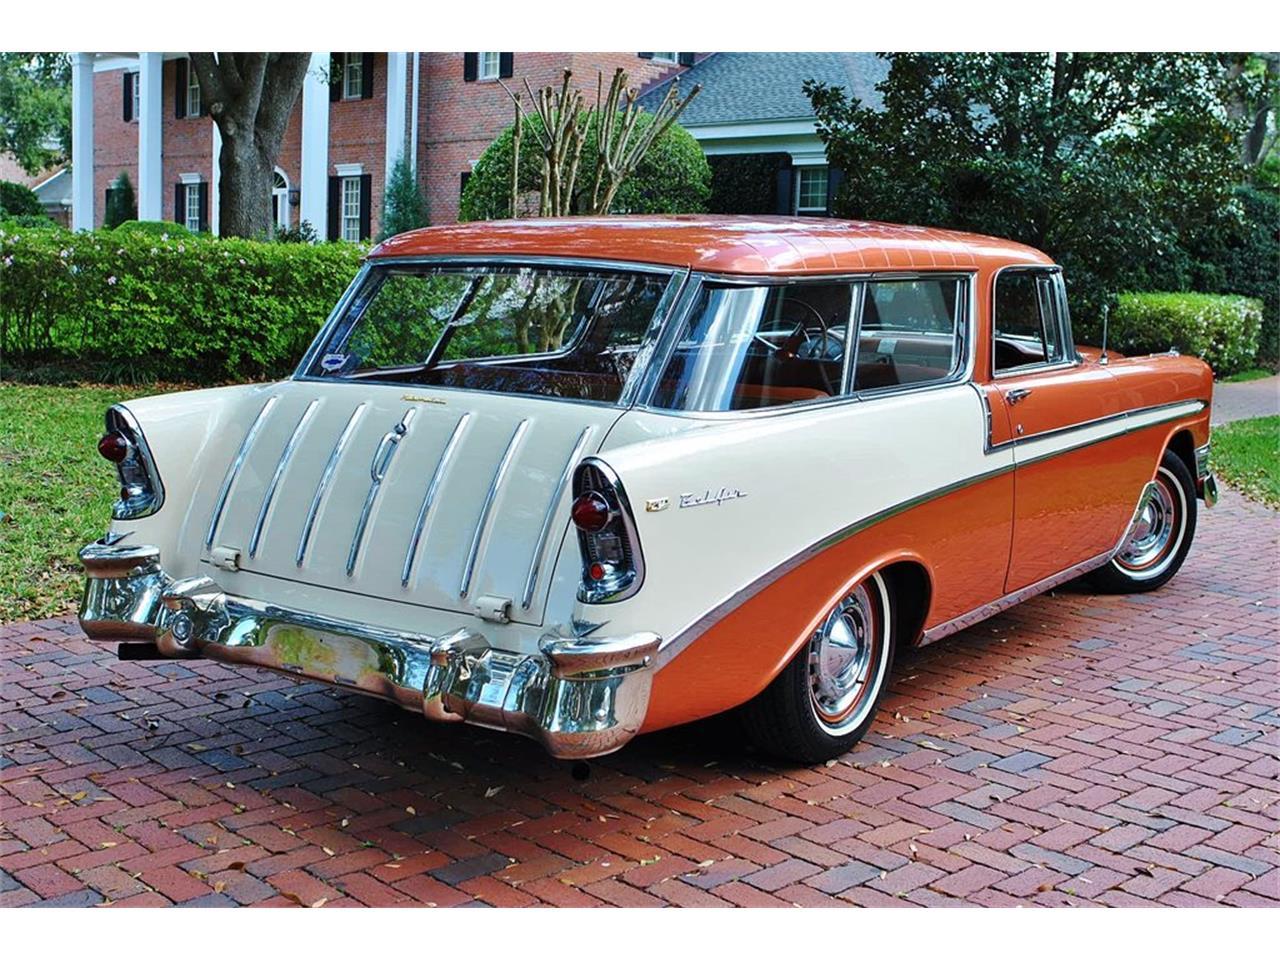 For Sale 1956 Chevrolet Nomad In Lakeland Florida